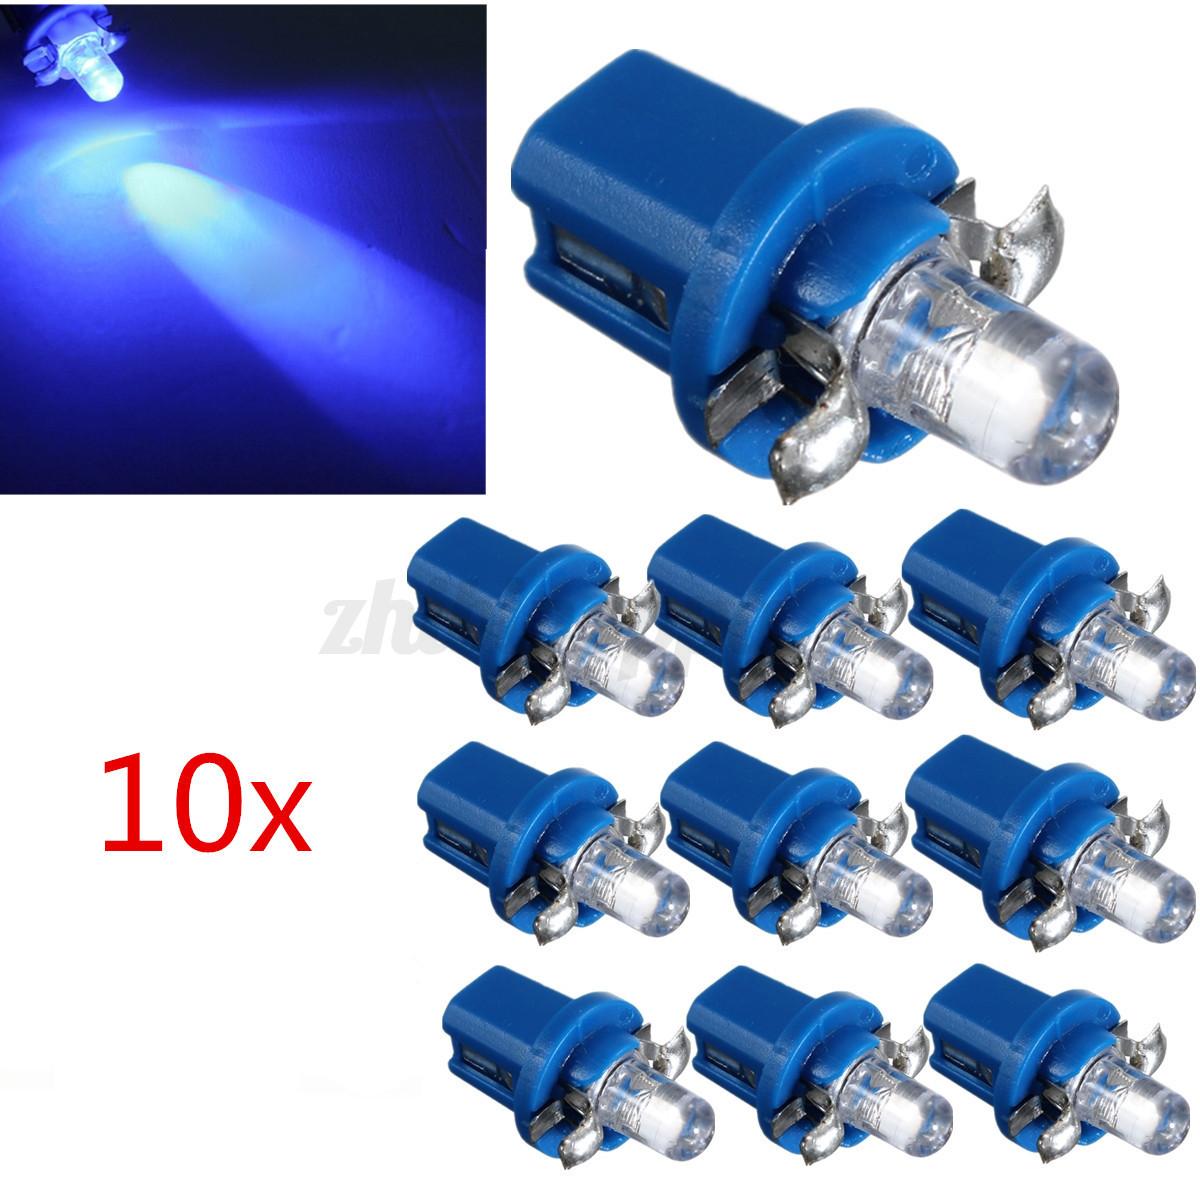 1-5-10pcs-B8-5D-T5-Gauge-LED-Speedo-Wedge-Dashboard-Dash-Interior-Car-Light-Bulb